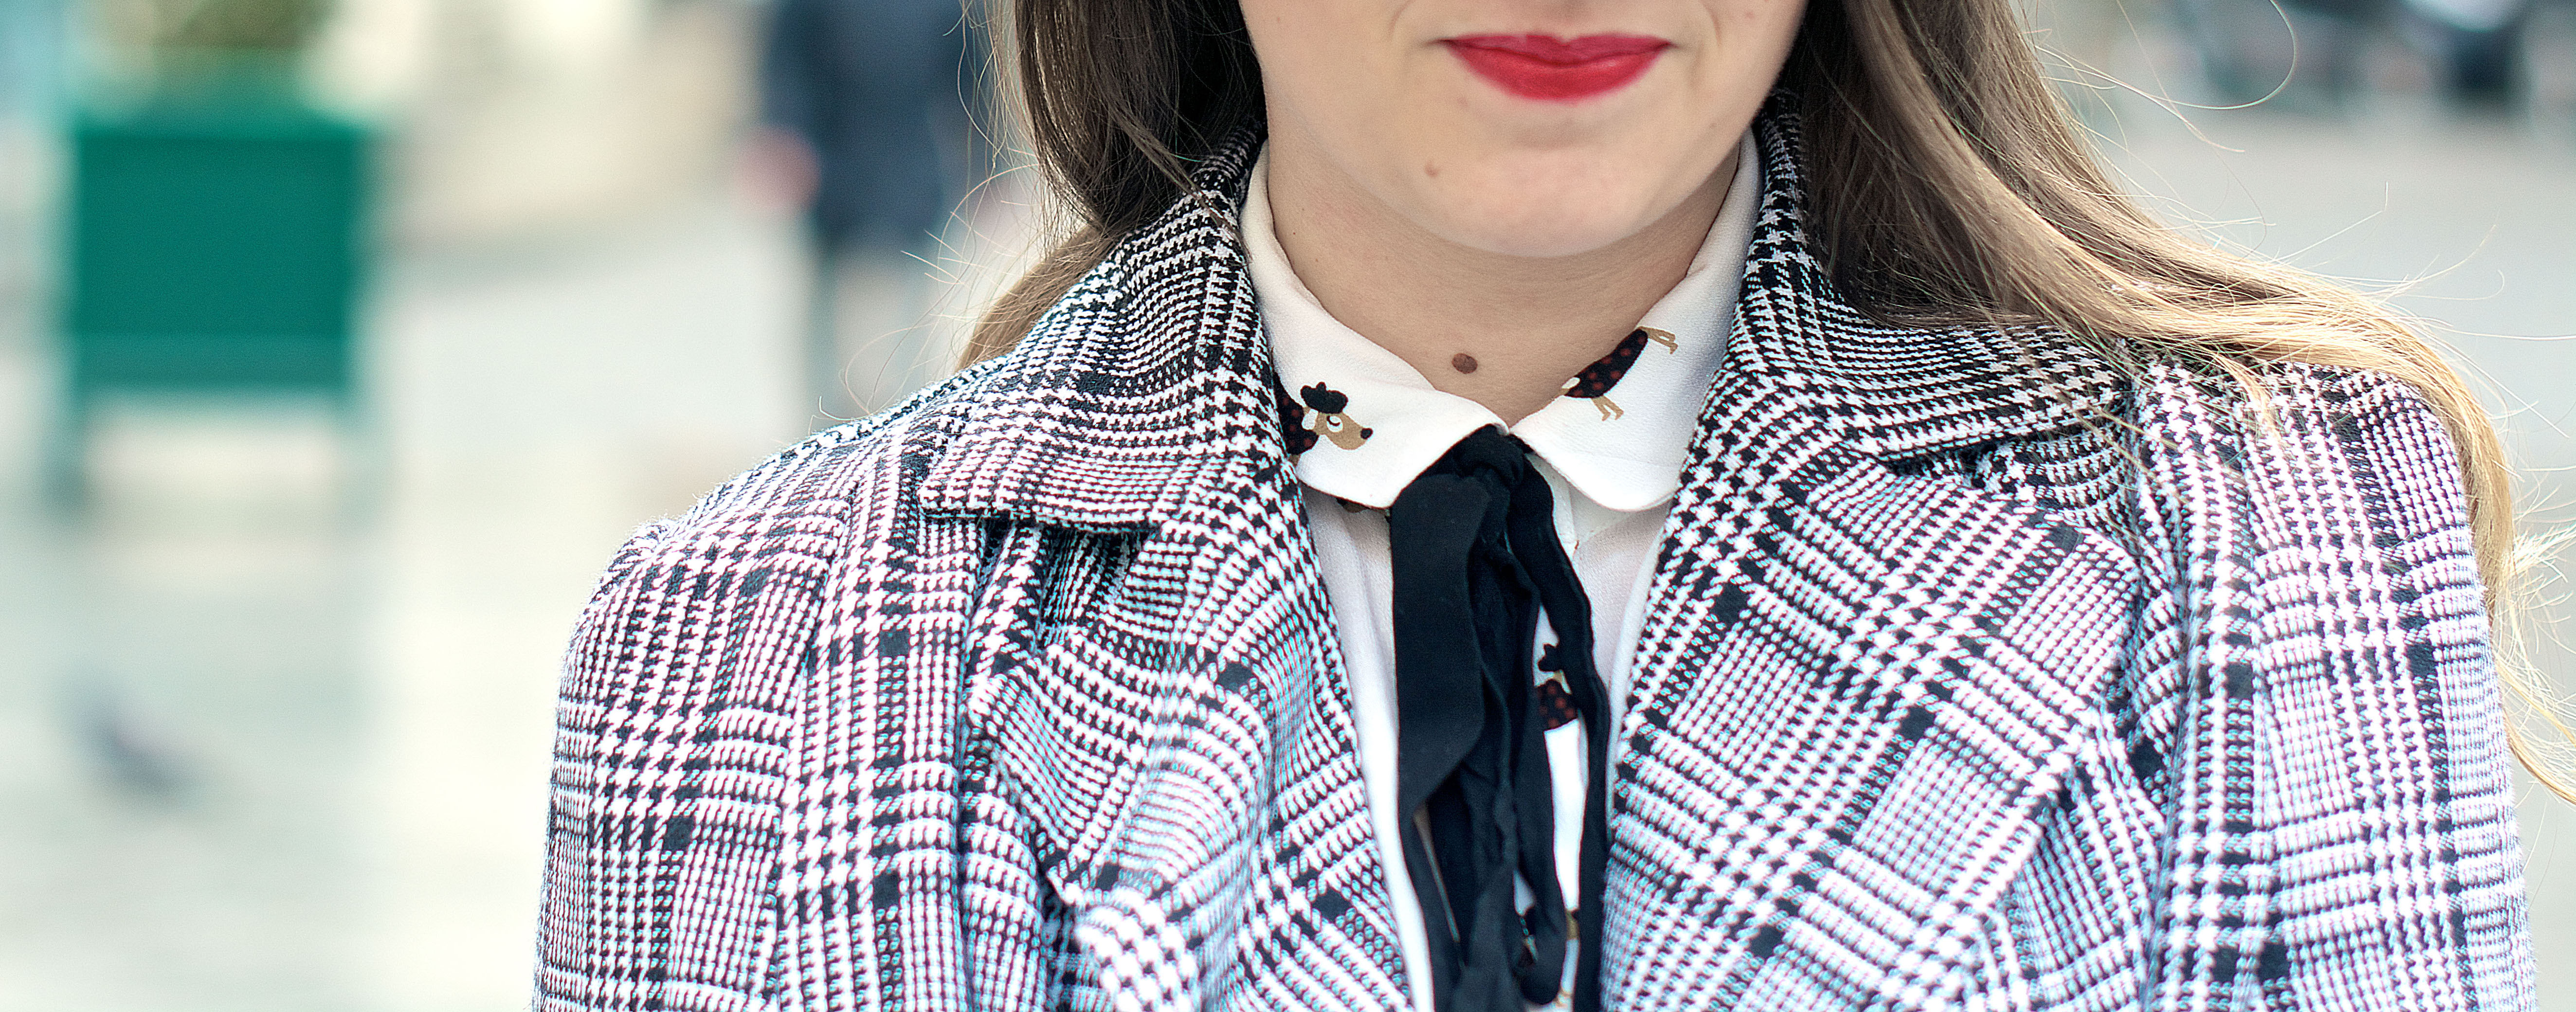 look-preppy-london-capetartan-shein-galeriesvivienne-paris-influencer-fashionblogger-chemiseretro-mango-jupepatineuse-bottineszara-vinyl-seralynepointcom_DSC3470